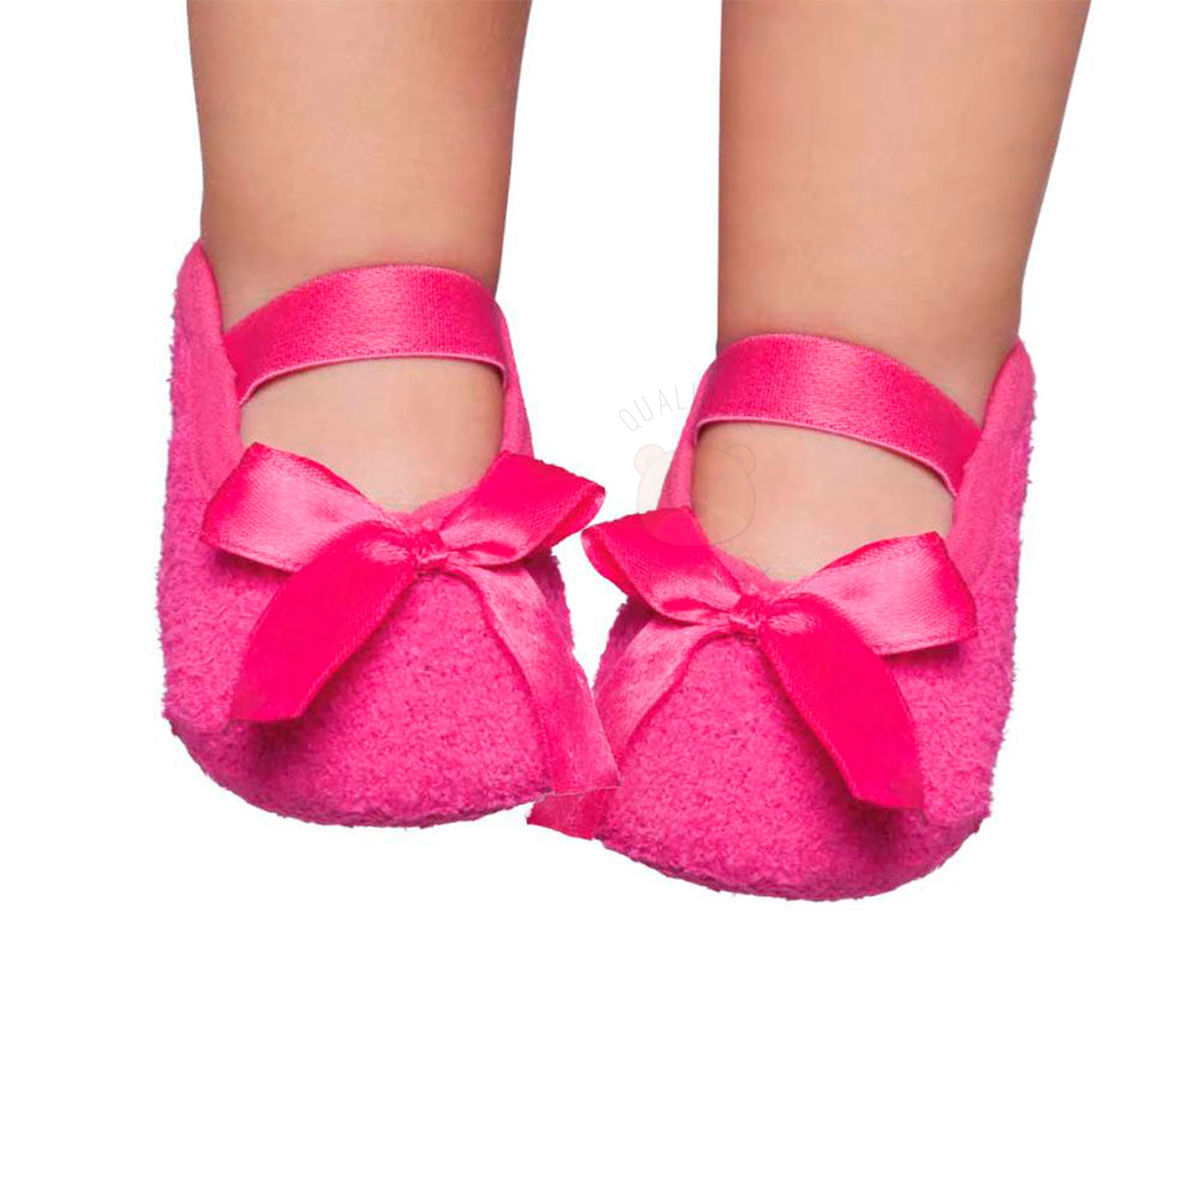 39faf99d95 Meia sapatilha para bebe em soft Pink - Puket no Bebefacil